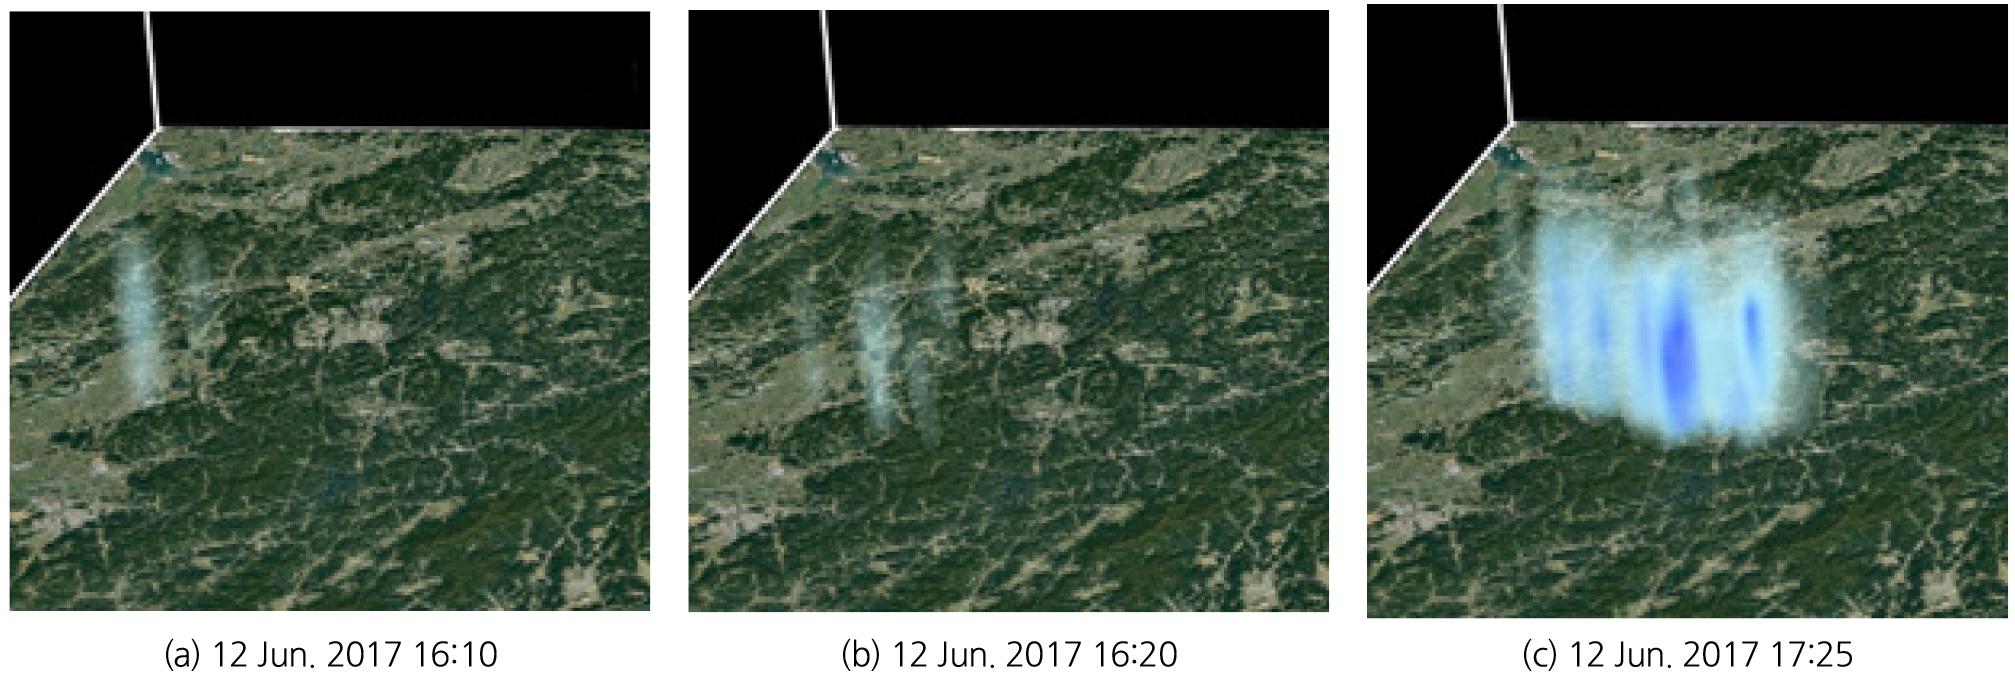 http://static.apub.kr/journalsite/sites/kwra/2020-053-04/N0200530408/images/kwra_53_04_08_F9.jpg